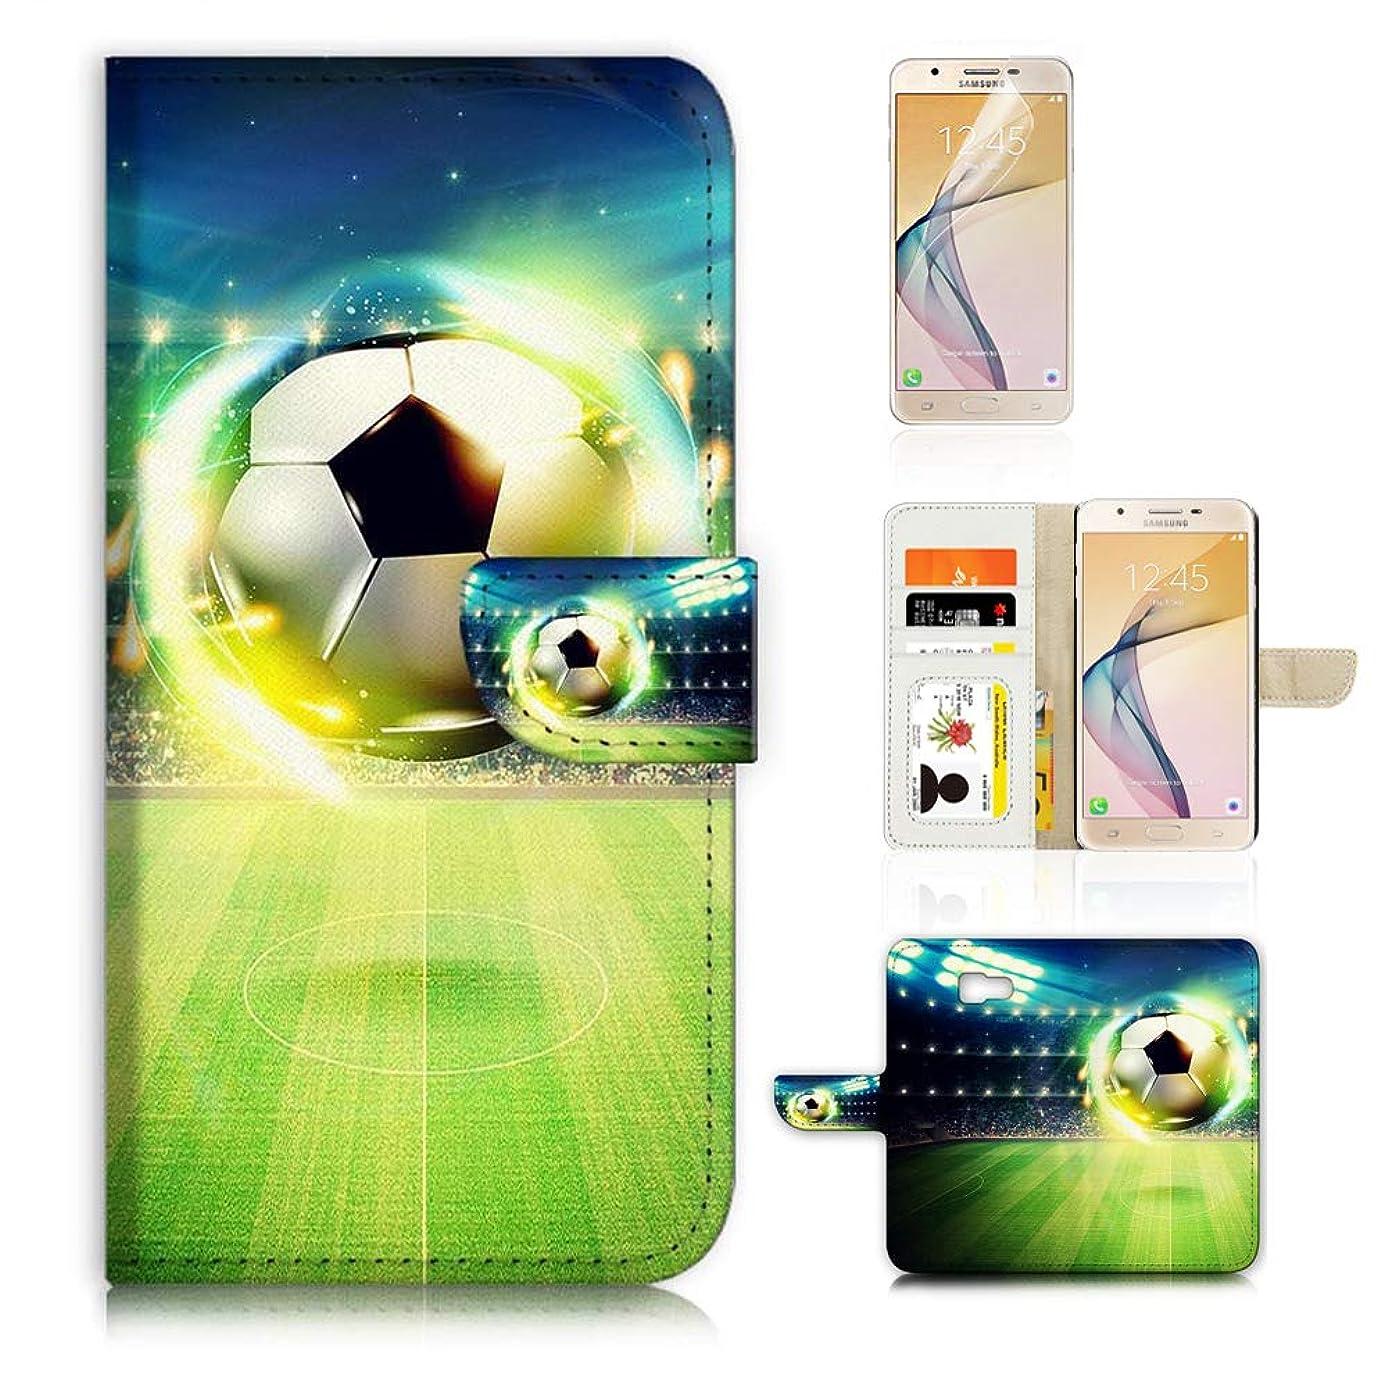 (for Samsung J7 Prime / J7 V / J7 Perx / J7 2017 / J7 Sky Pro/Galaxy Halo) Flip Wallet Case Cover & Screen Protector Bundle - A21678 Soccer Football